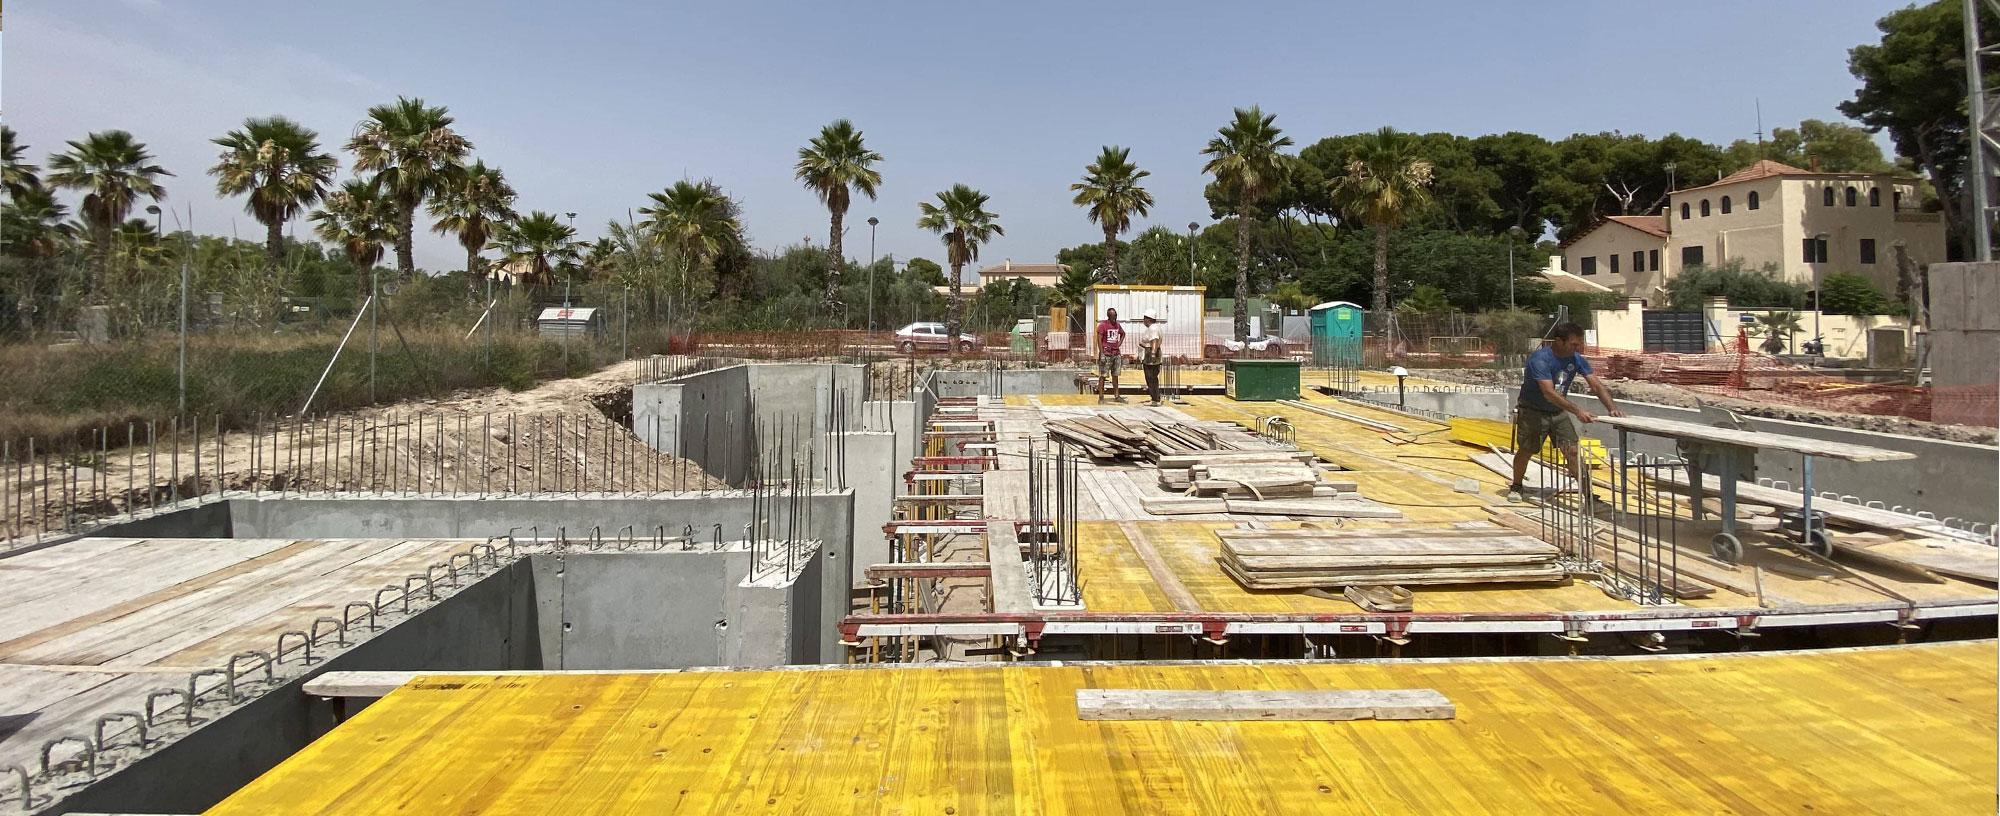 938_BLOG-Comenzamos nuevo Proyecto Cohousing San Juan